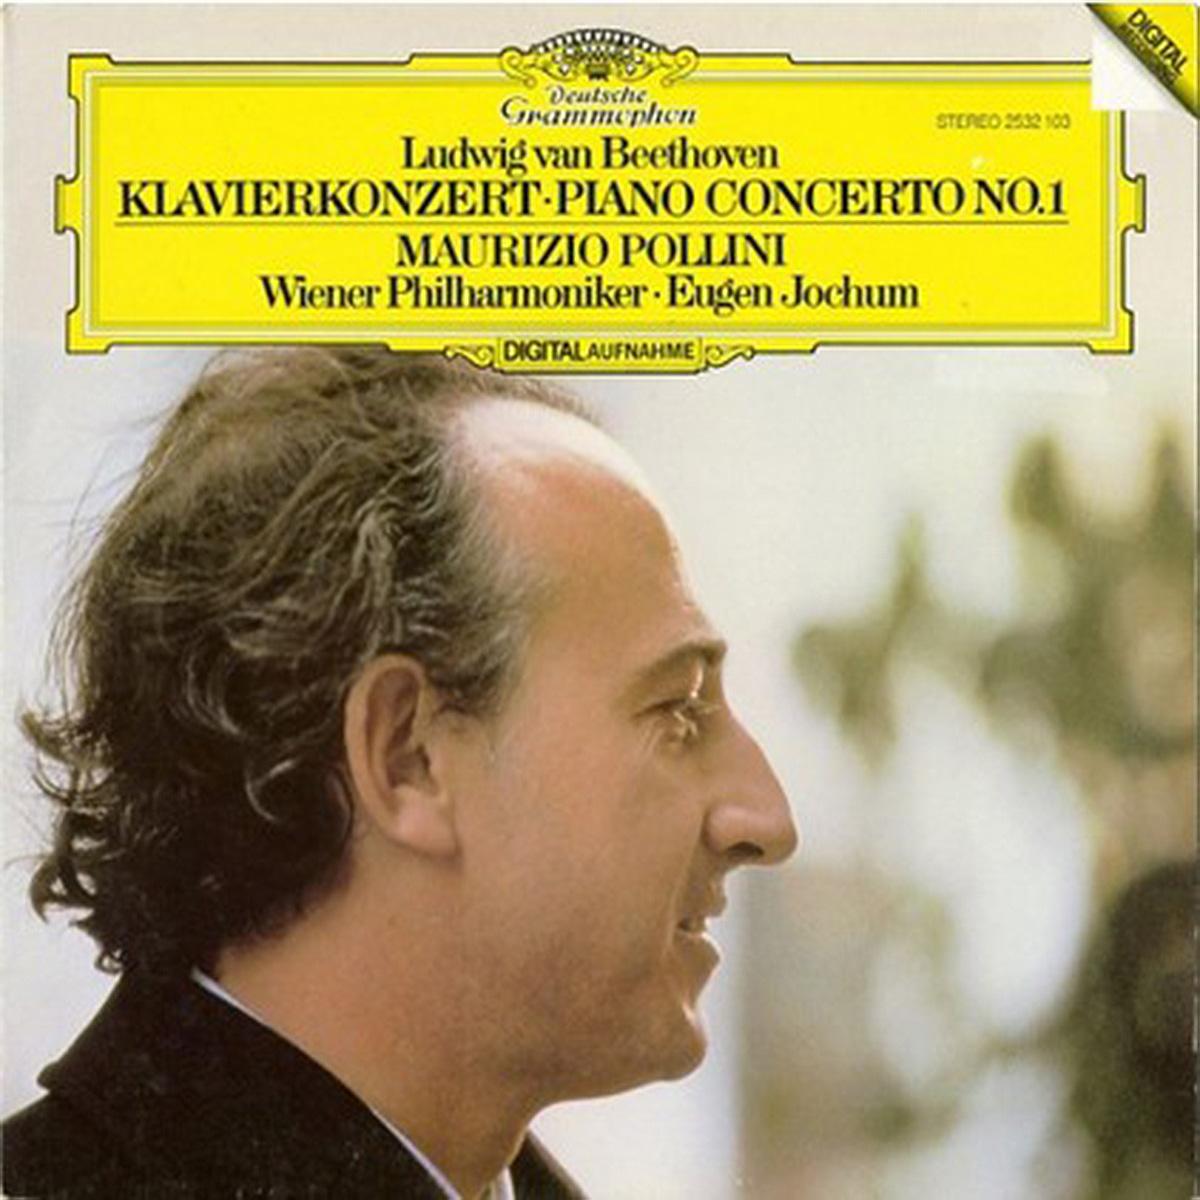 DGG 2532103 Beethoven Concerto Piano 1 Pollini Jochum